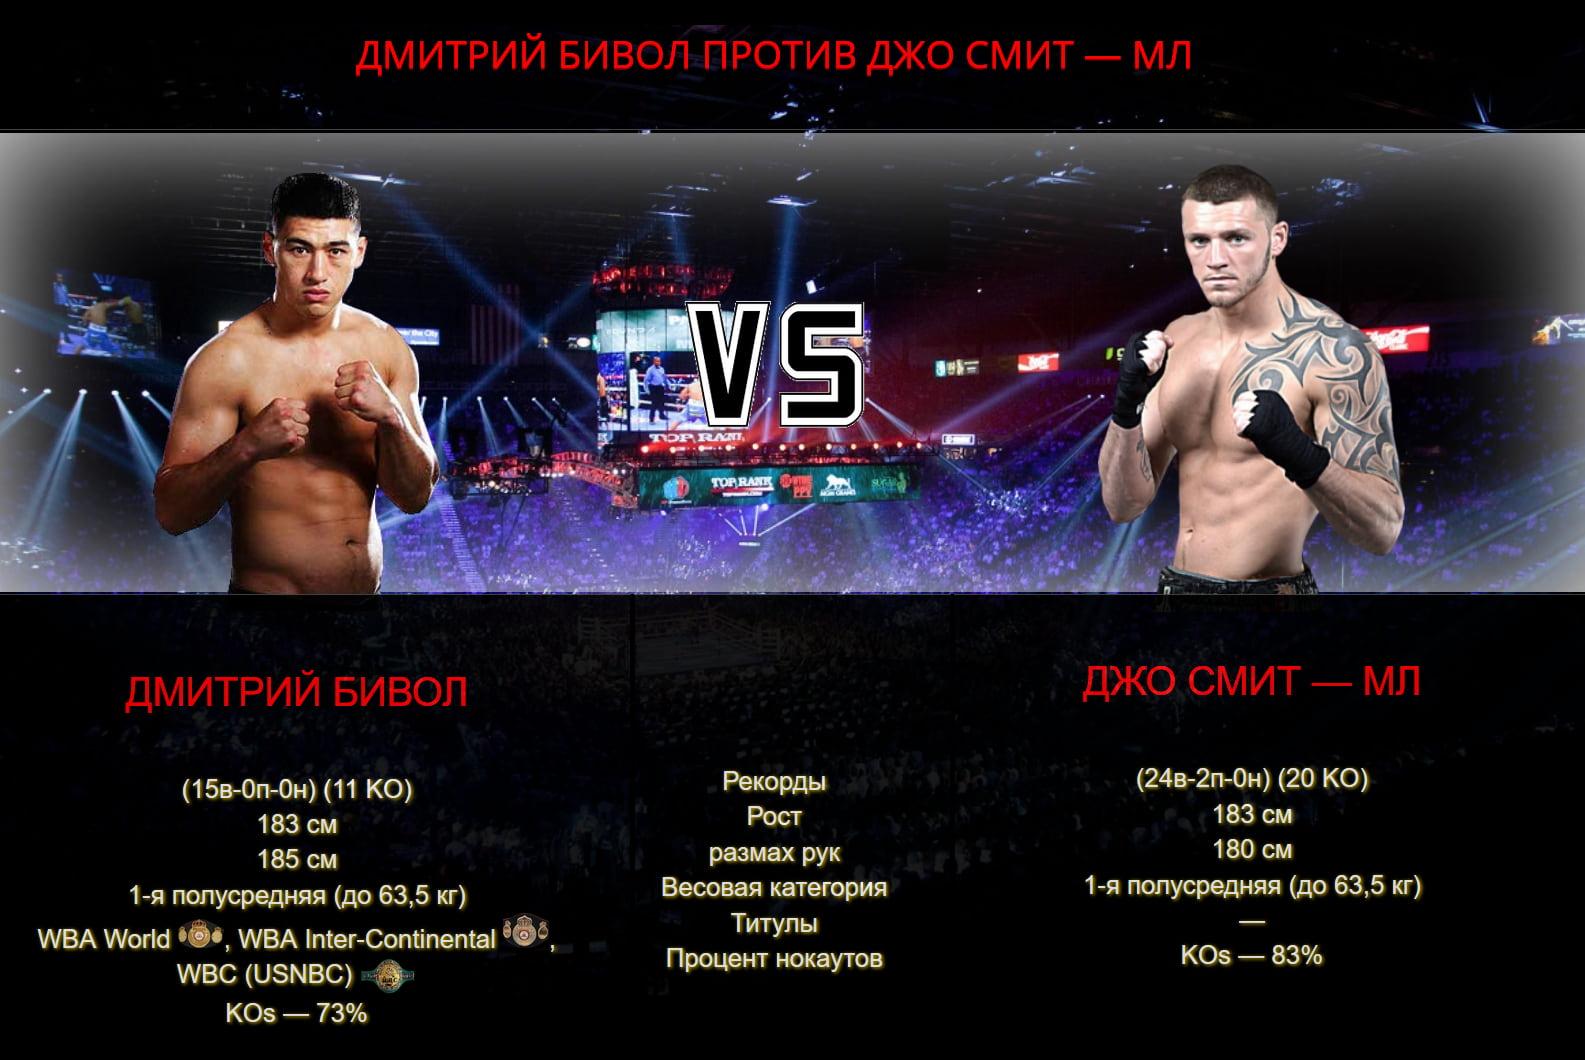 Дмитрий Бивол против Джо Смит - мл